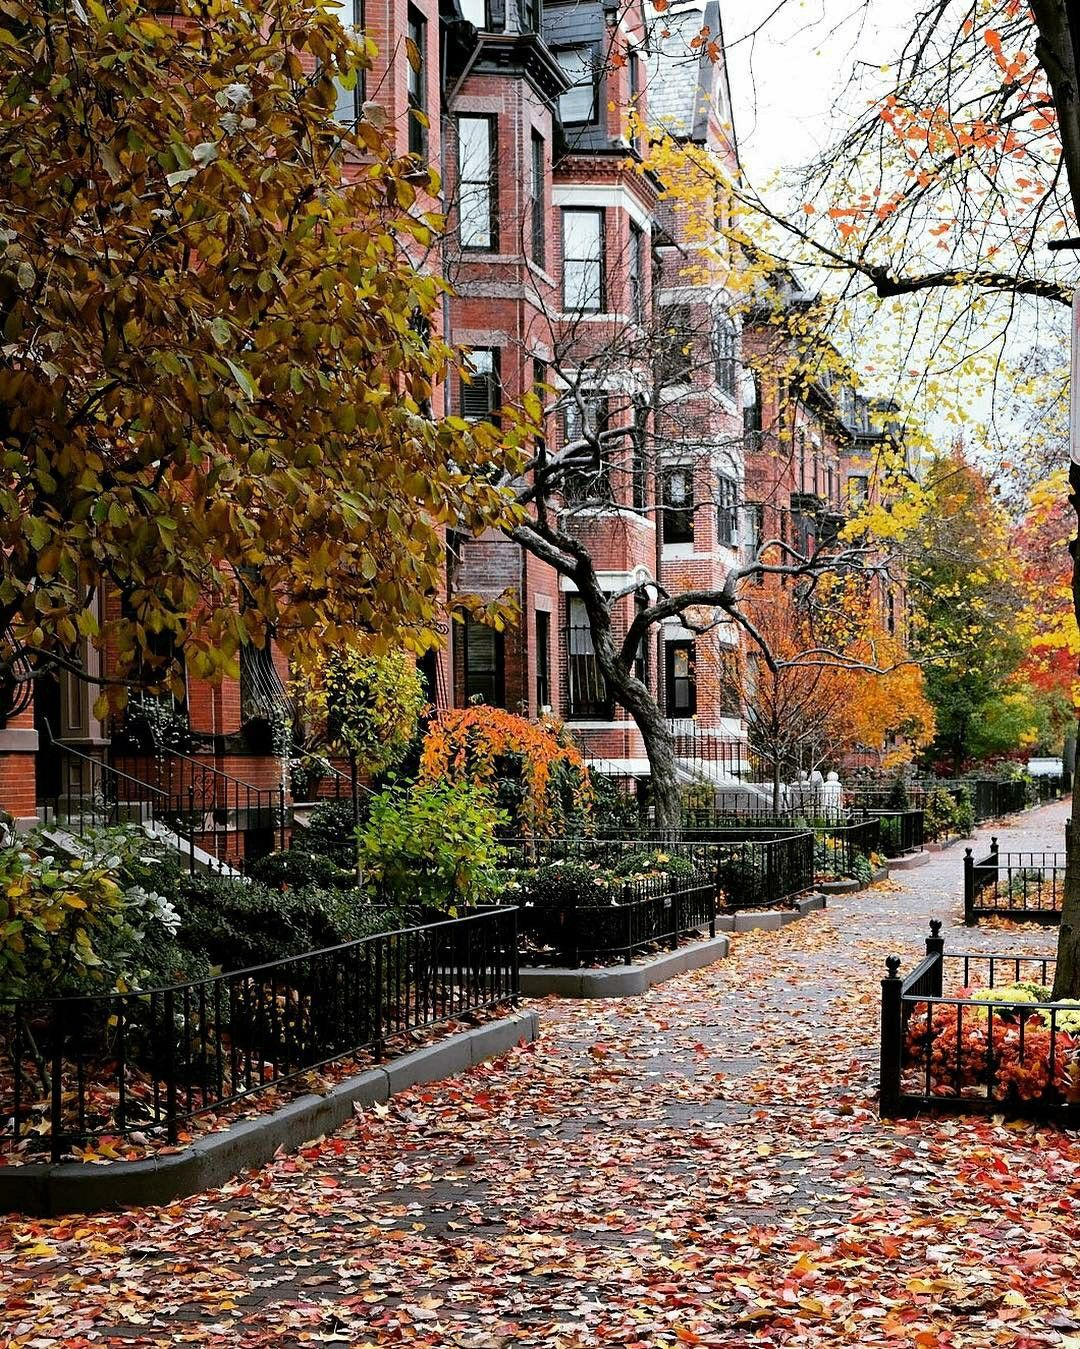 Nice Fall City Photo